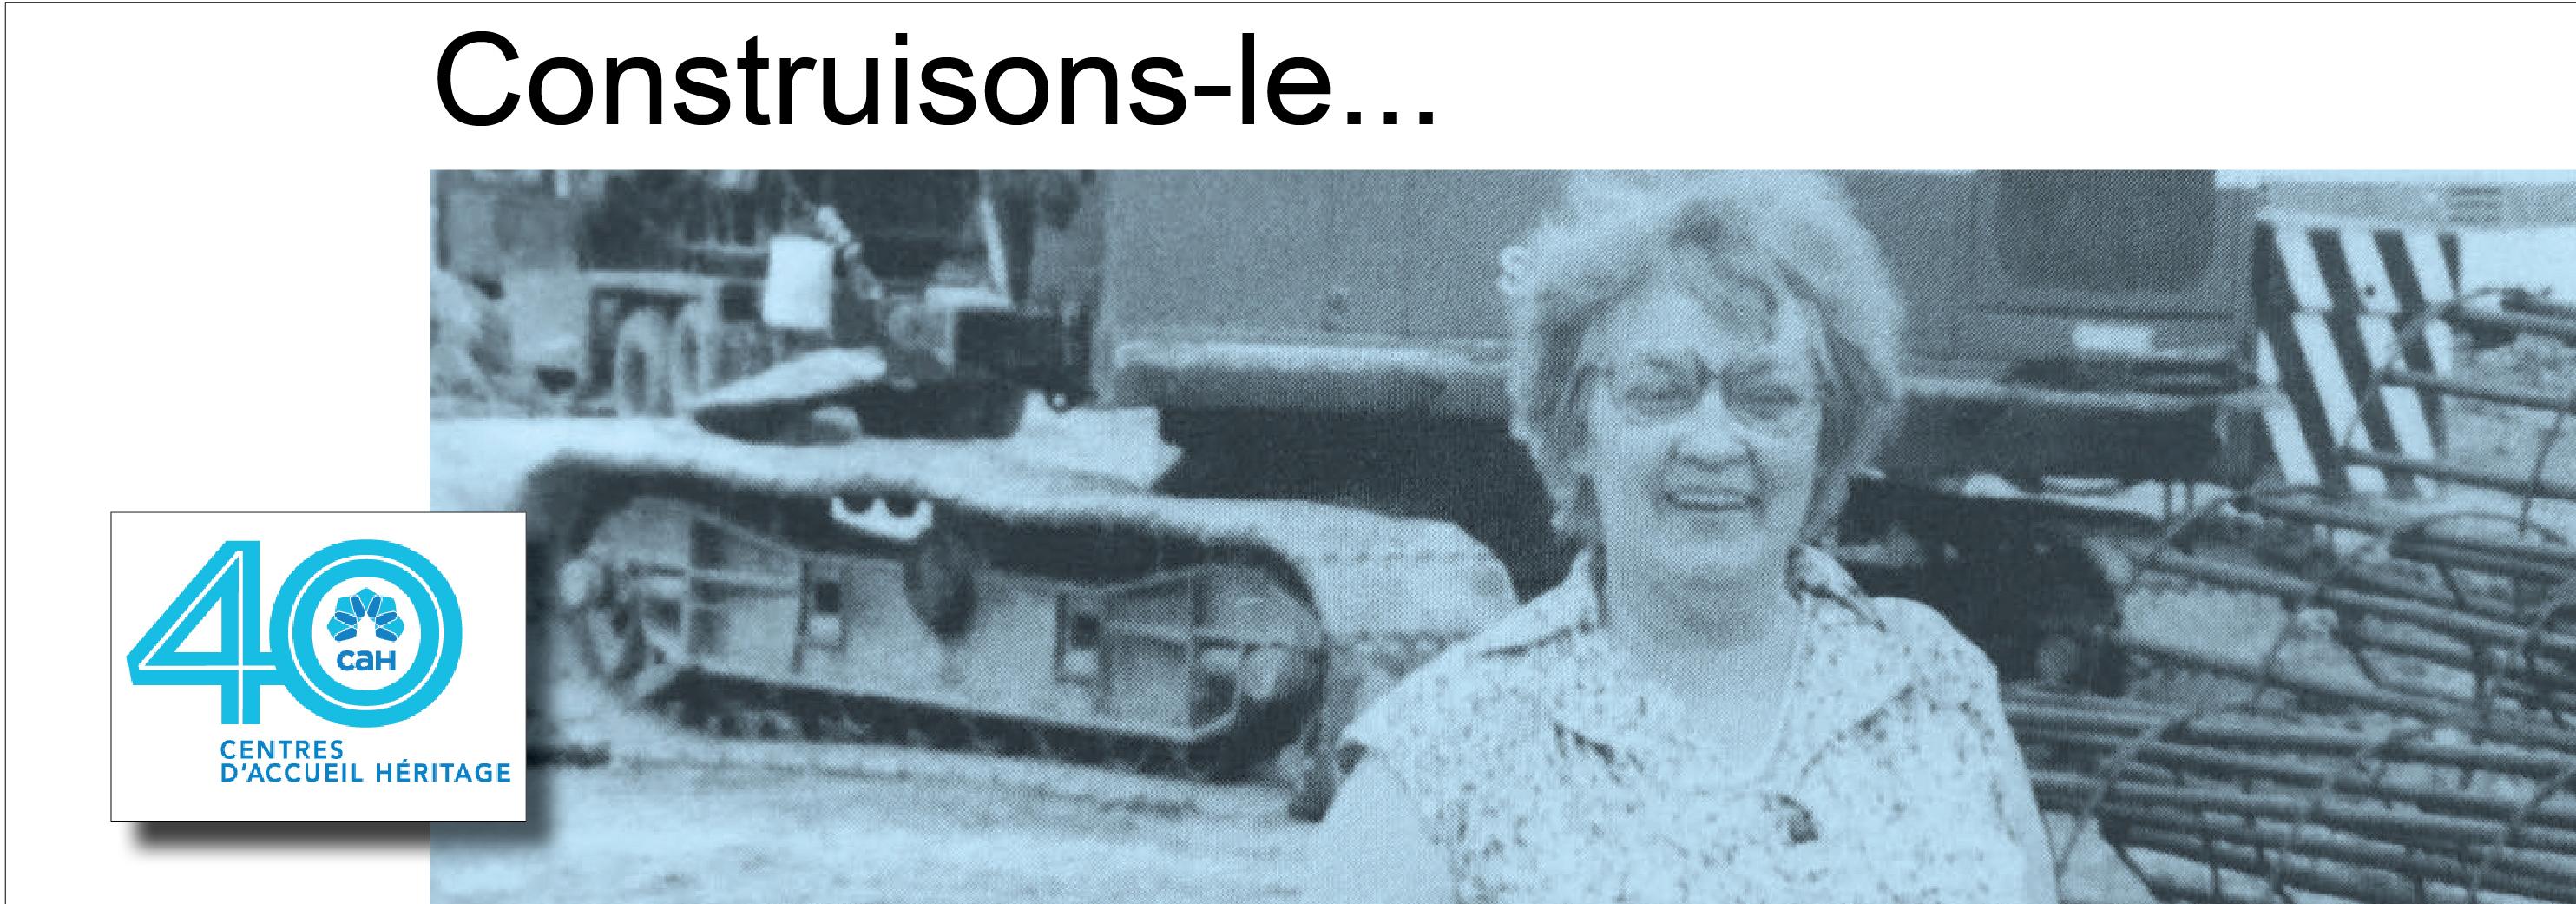 La vision de Simone Lantaigne